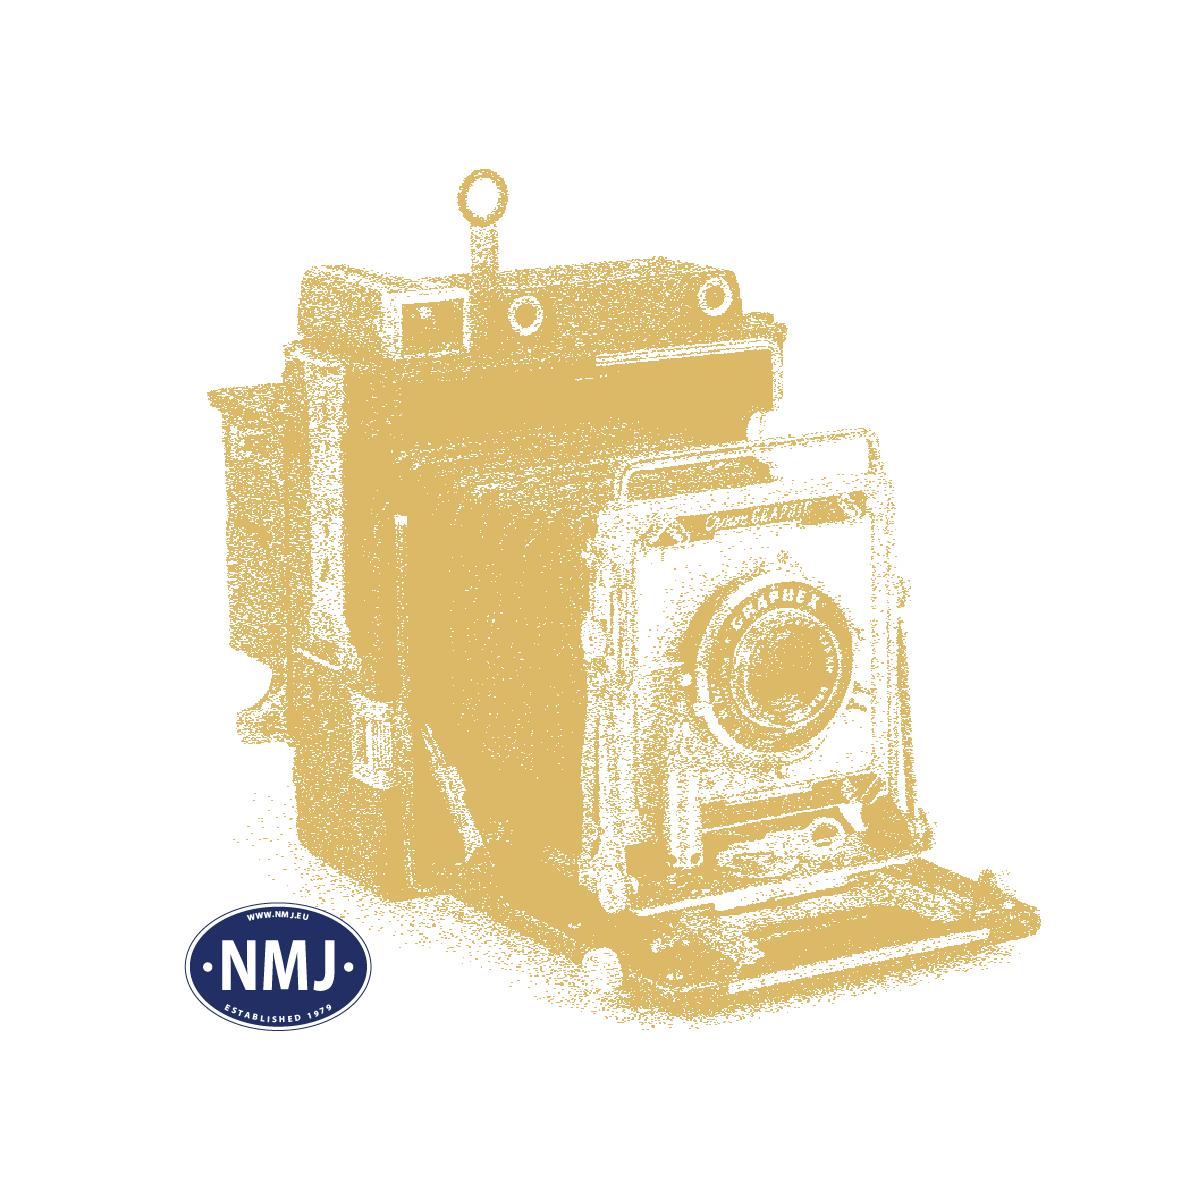 NMJT90105 - NMJ Topline DSB MY 1150, DC